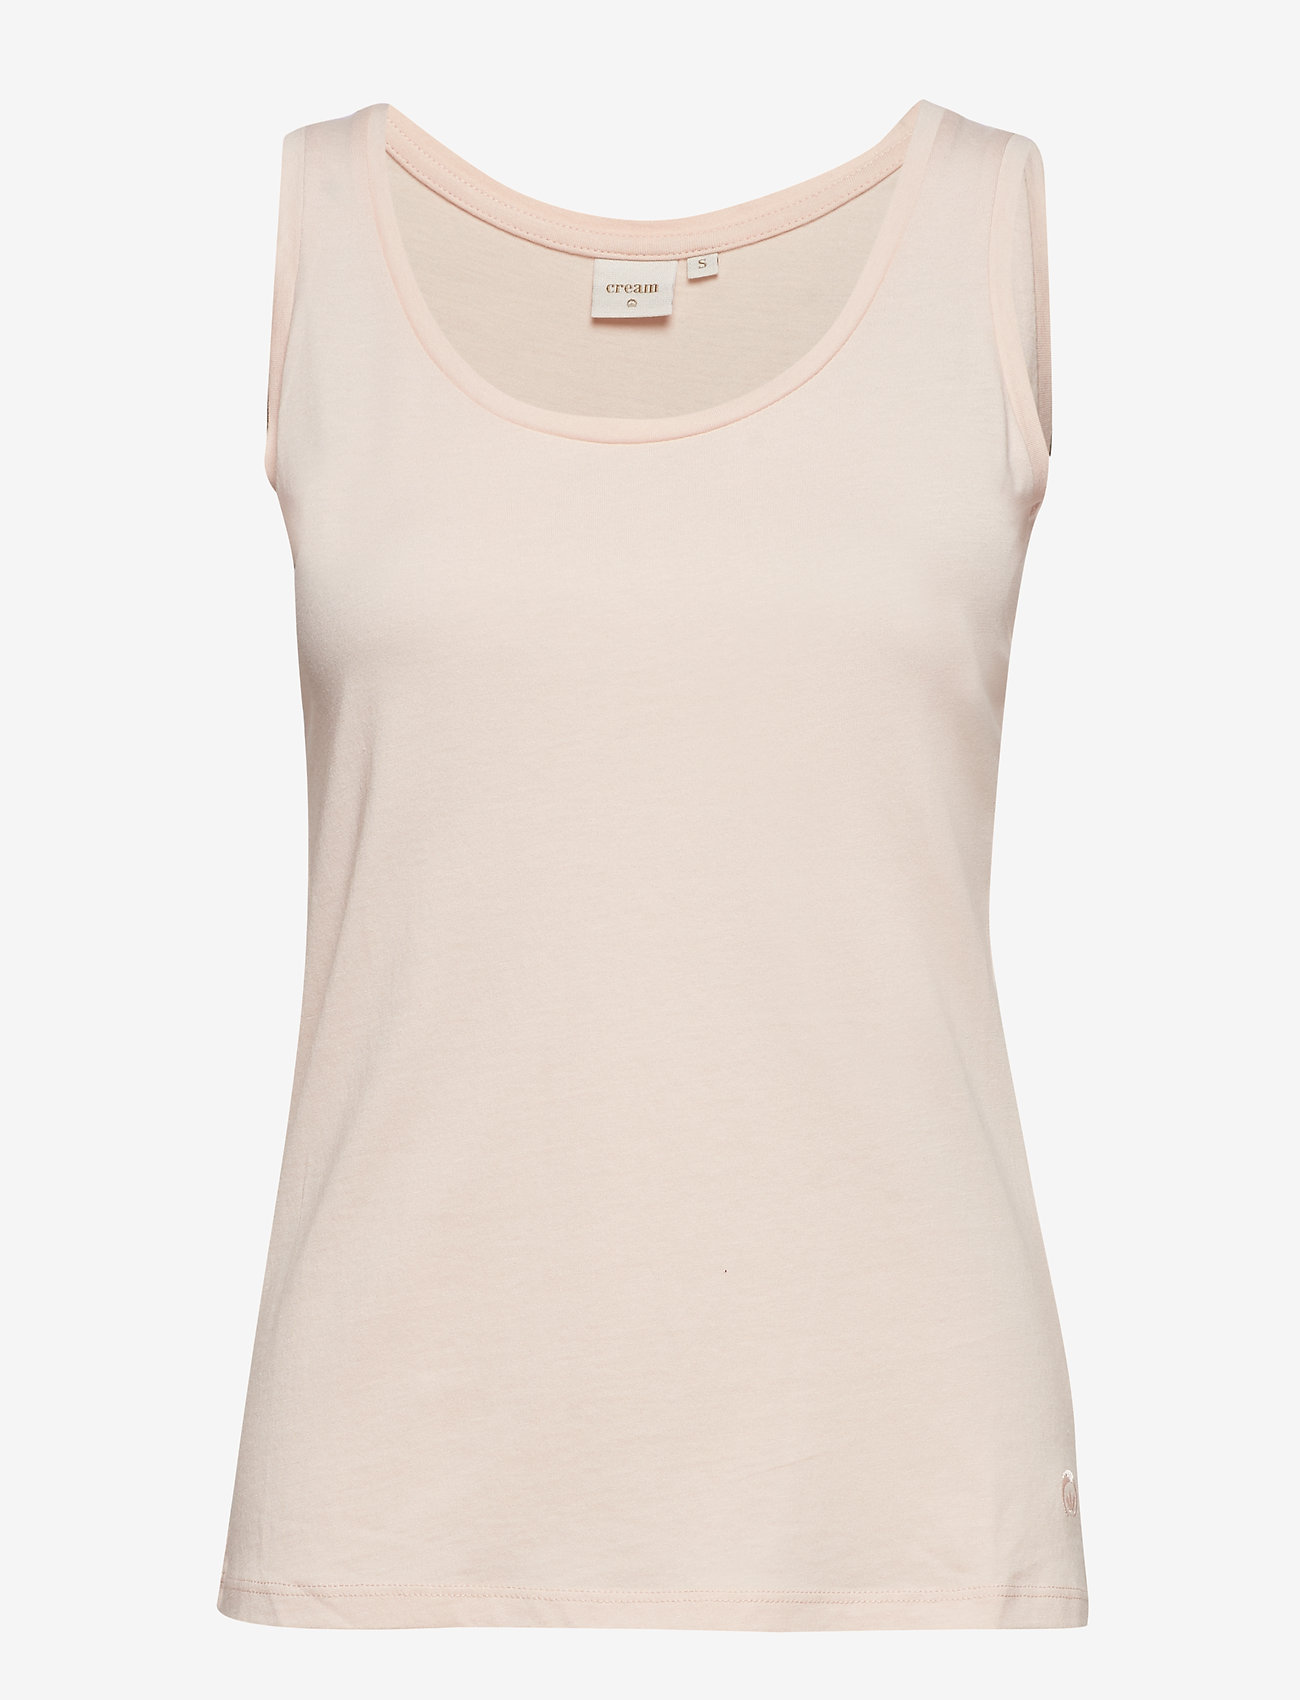 Cream - Naia o-neck tank top - topy bez rękawów - sunshine rose